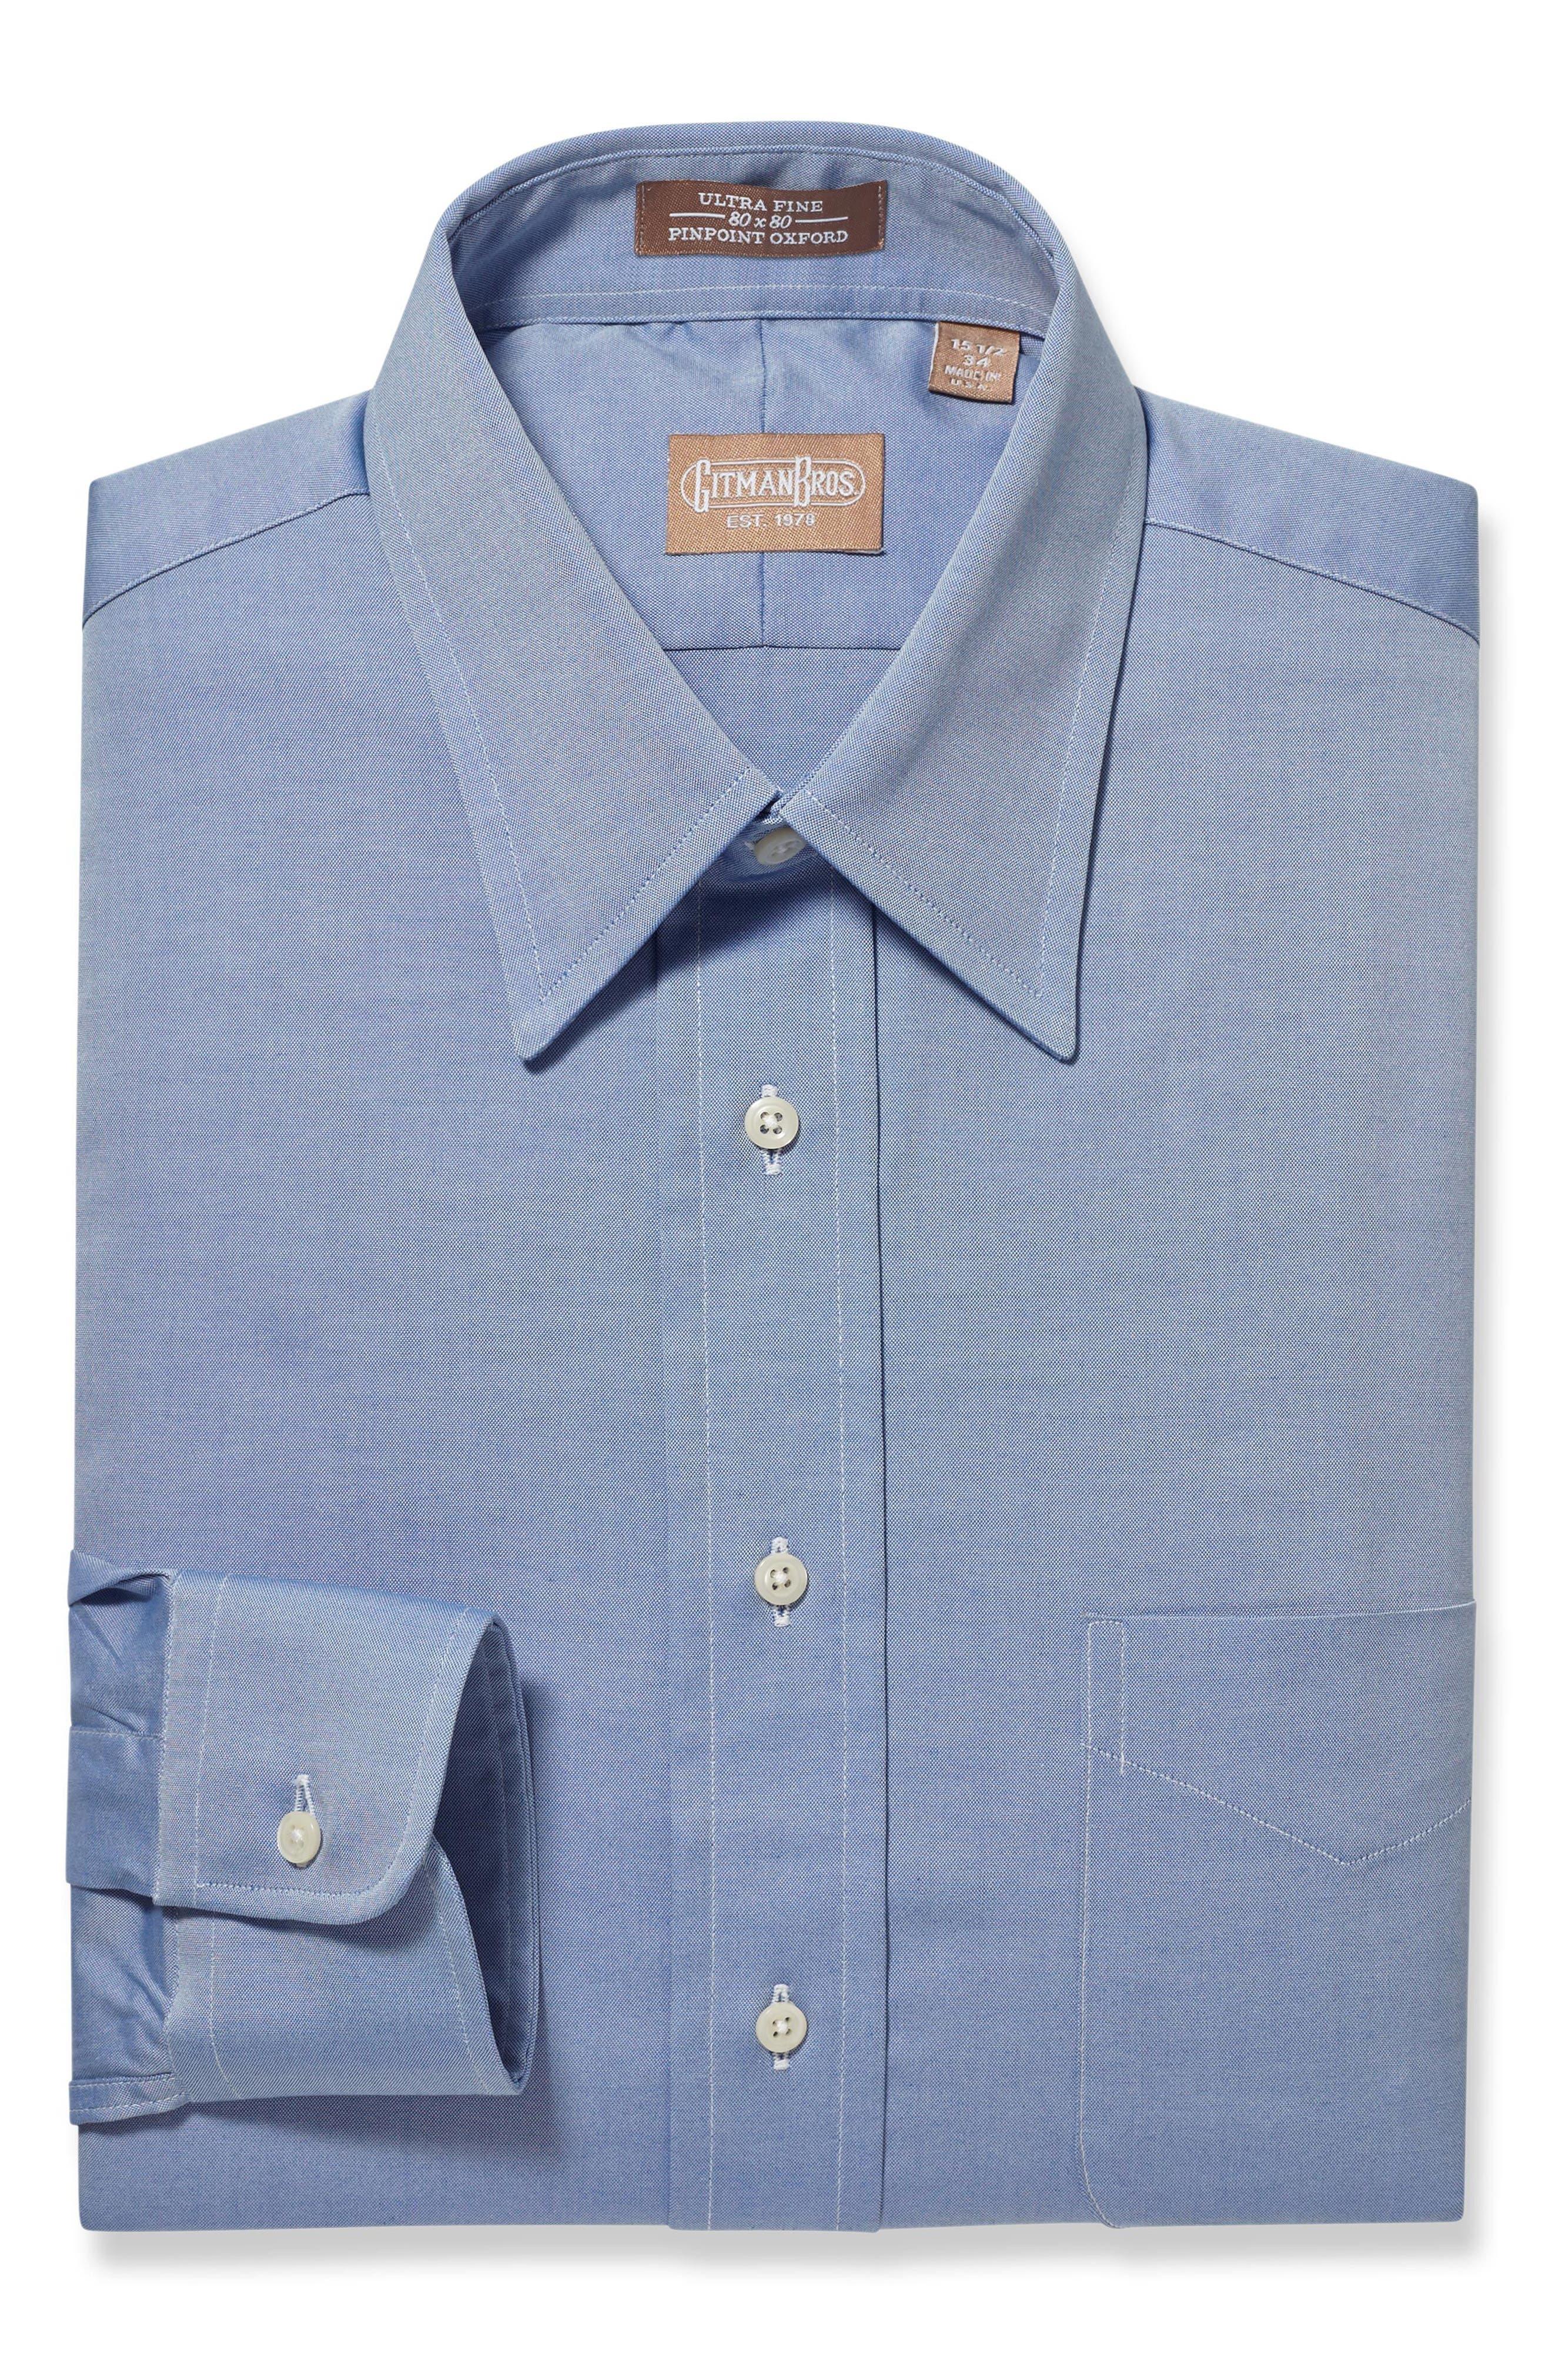 Regular Fit Solid Dress Shirt,                             Main thumbnail 1, color,                             Blue